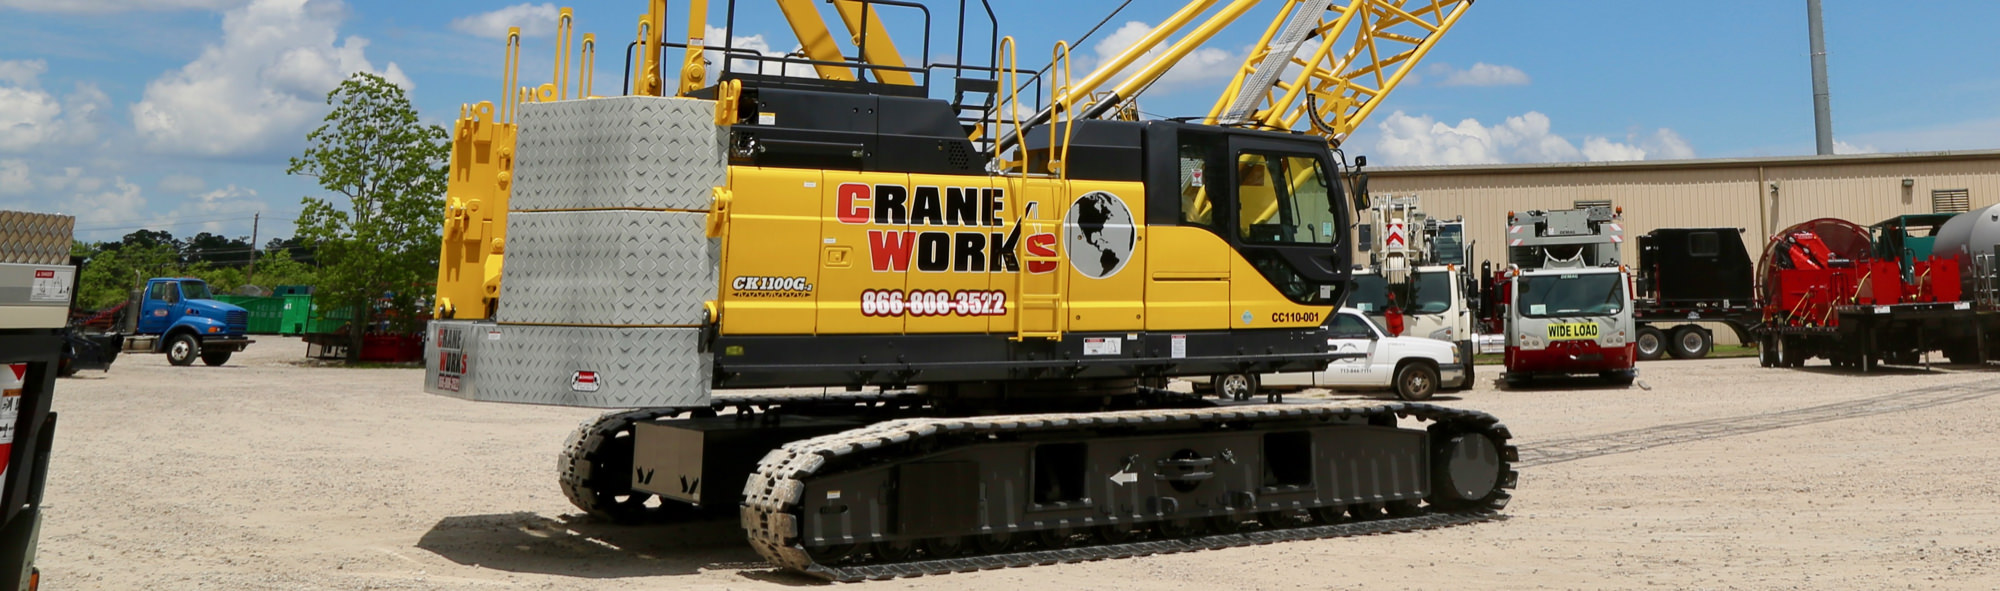 kobelco-ck1100g2-crawler-crane